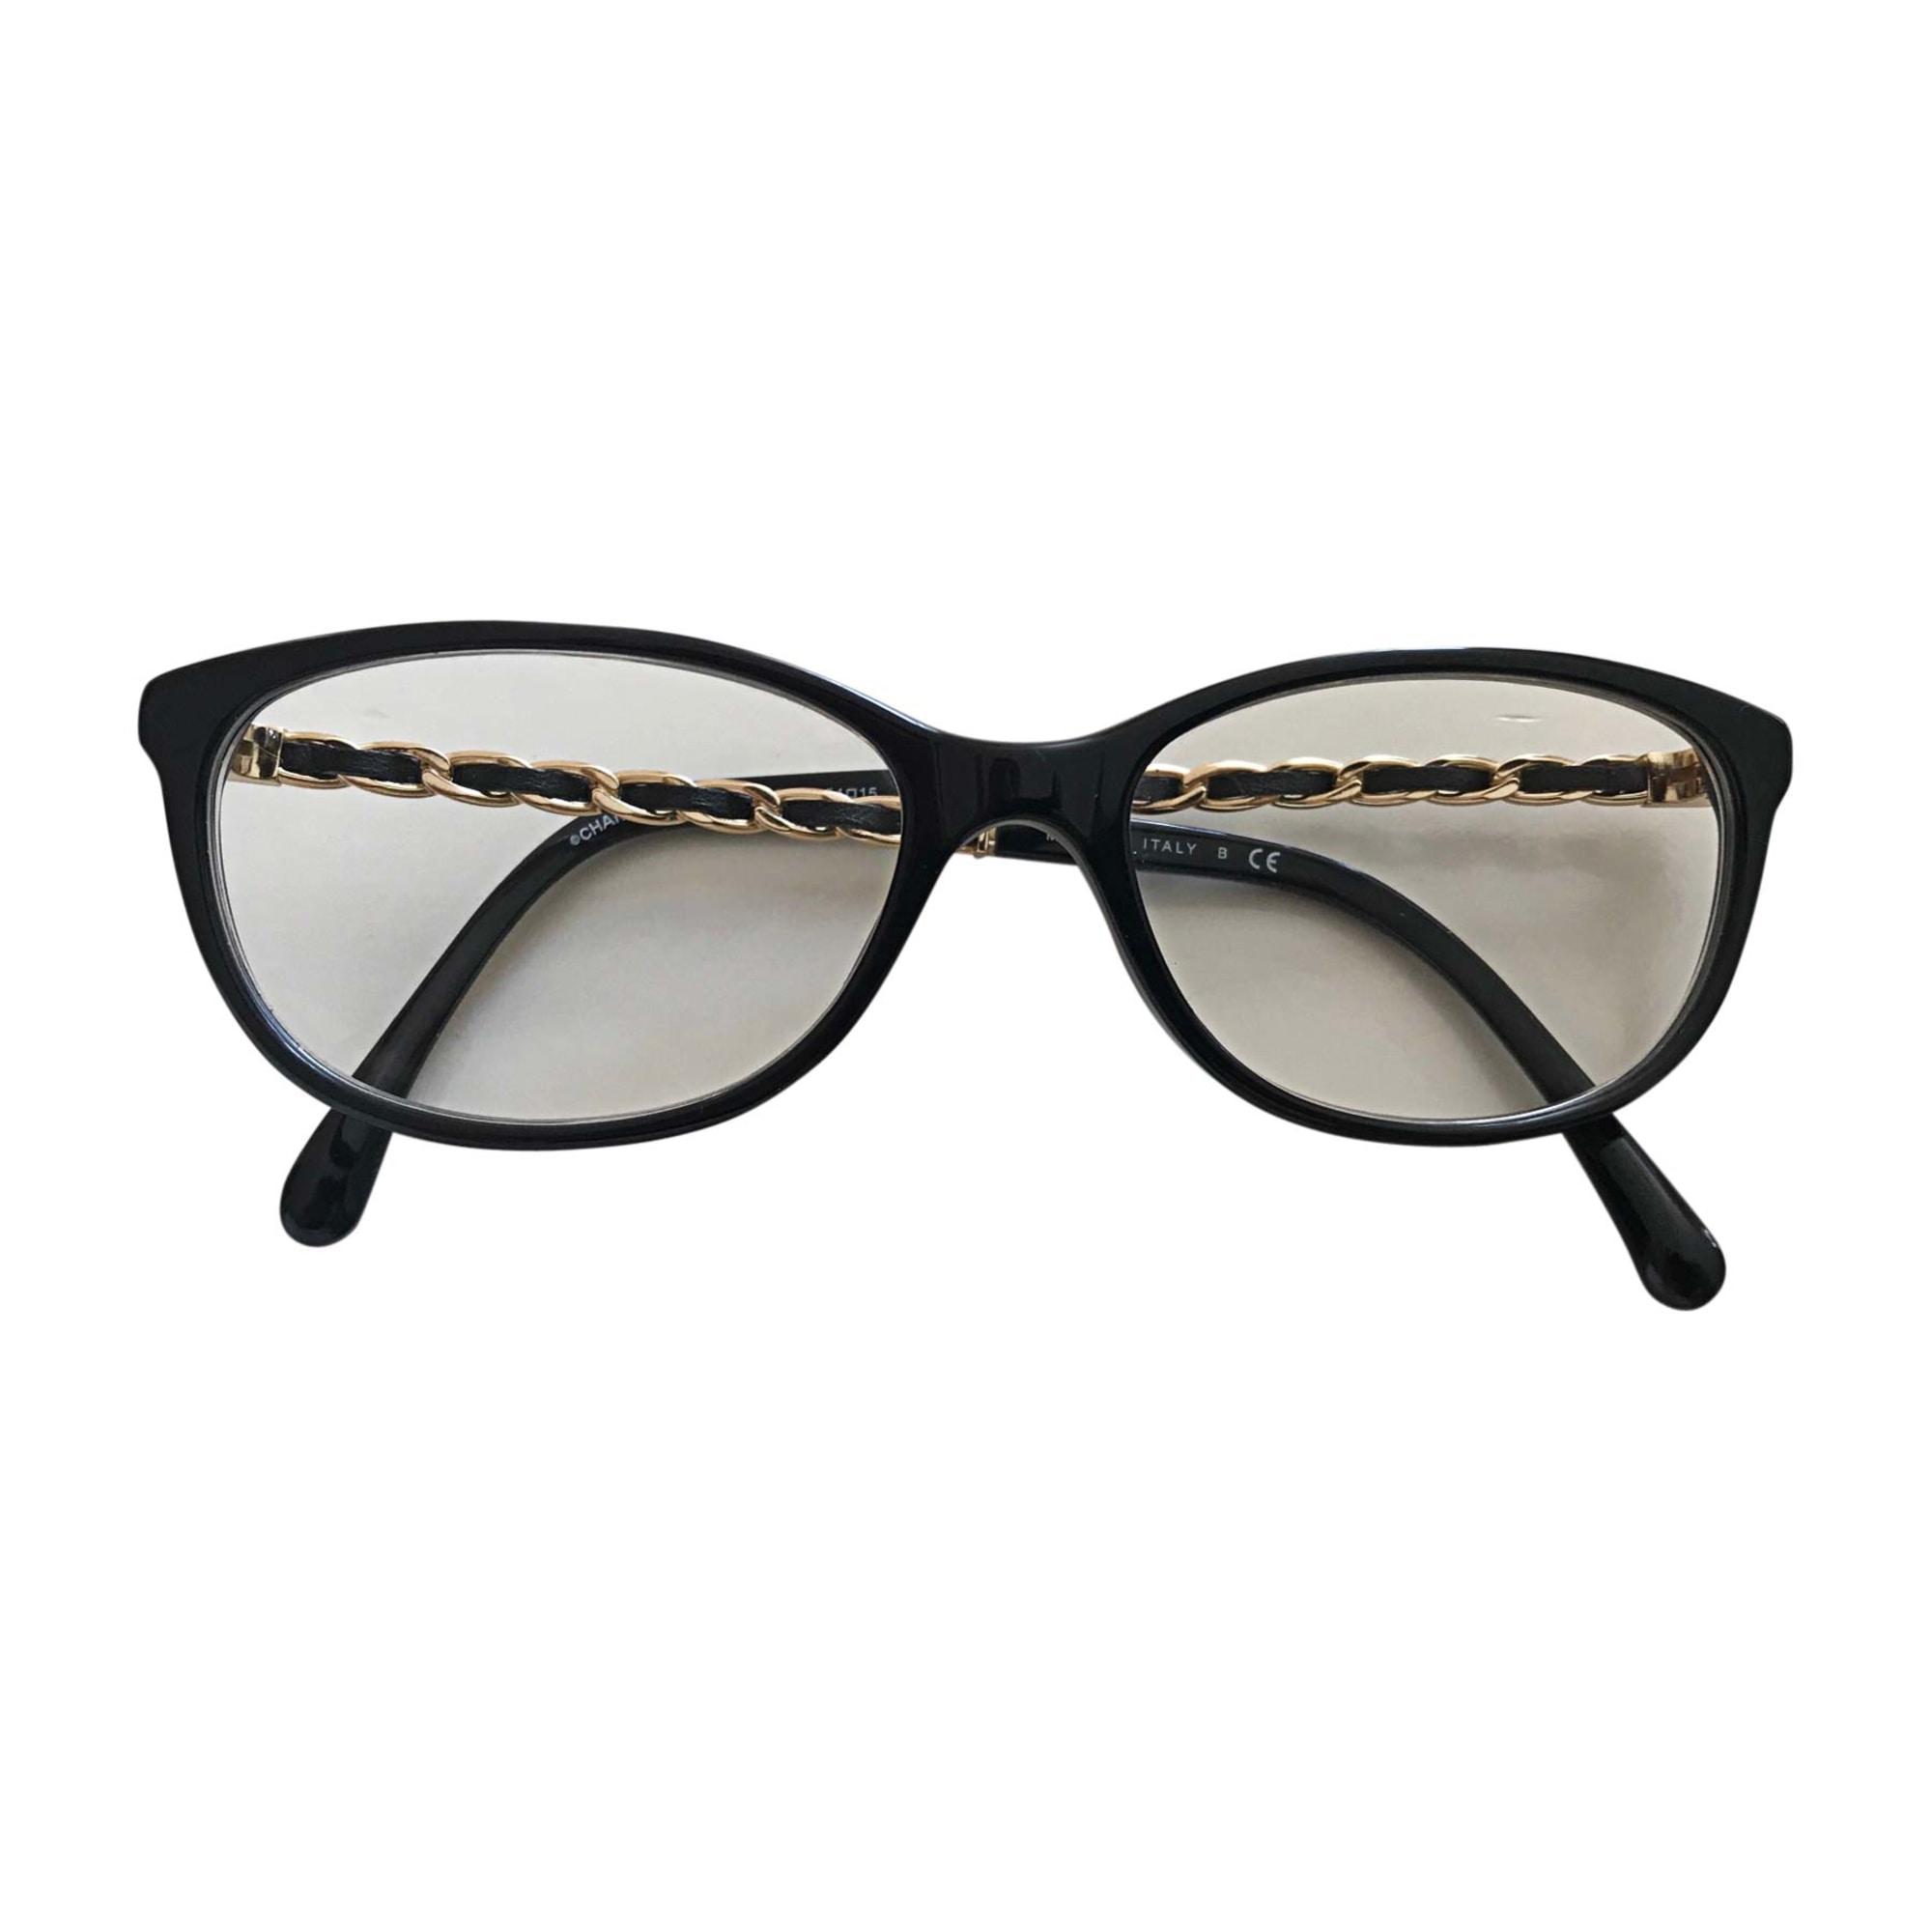 Eyeglass Frames CHANEL black vendu par D\'elisa:284259 - 7789278